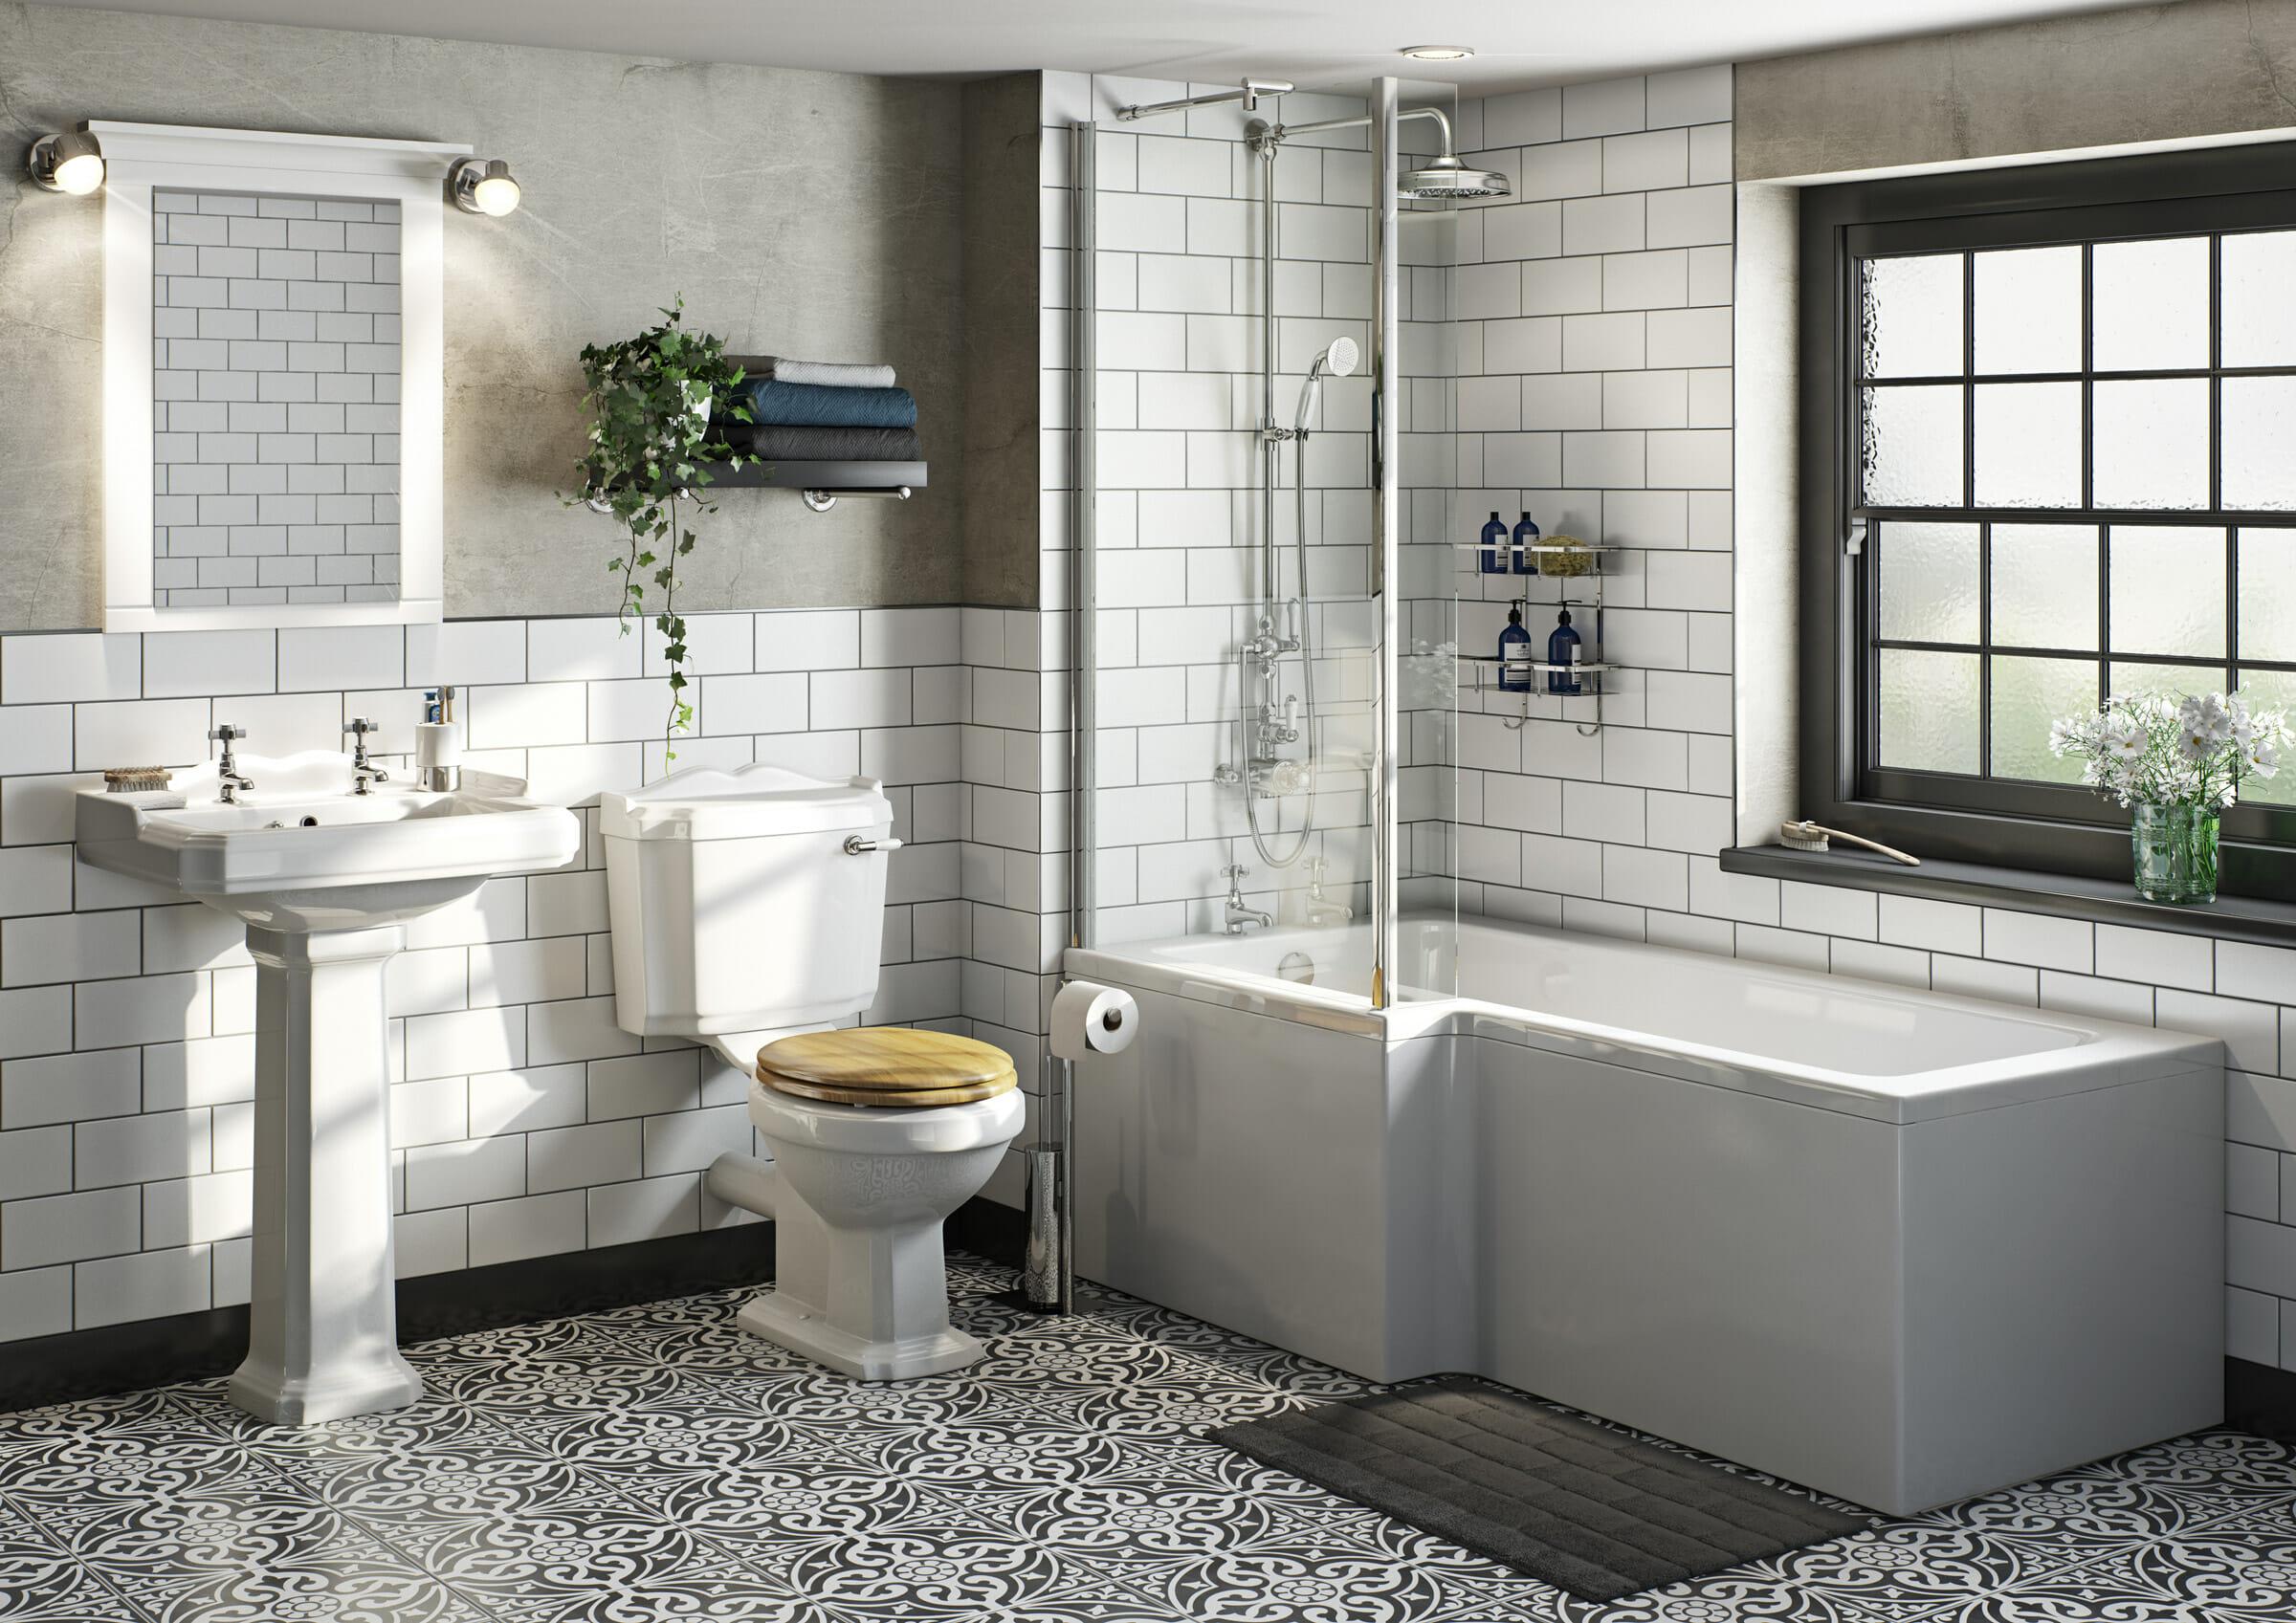 multi-generational family bathroom